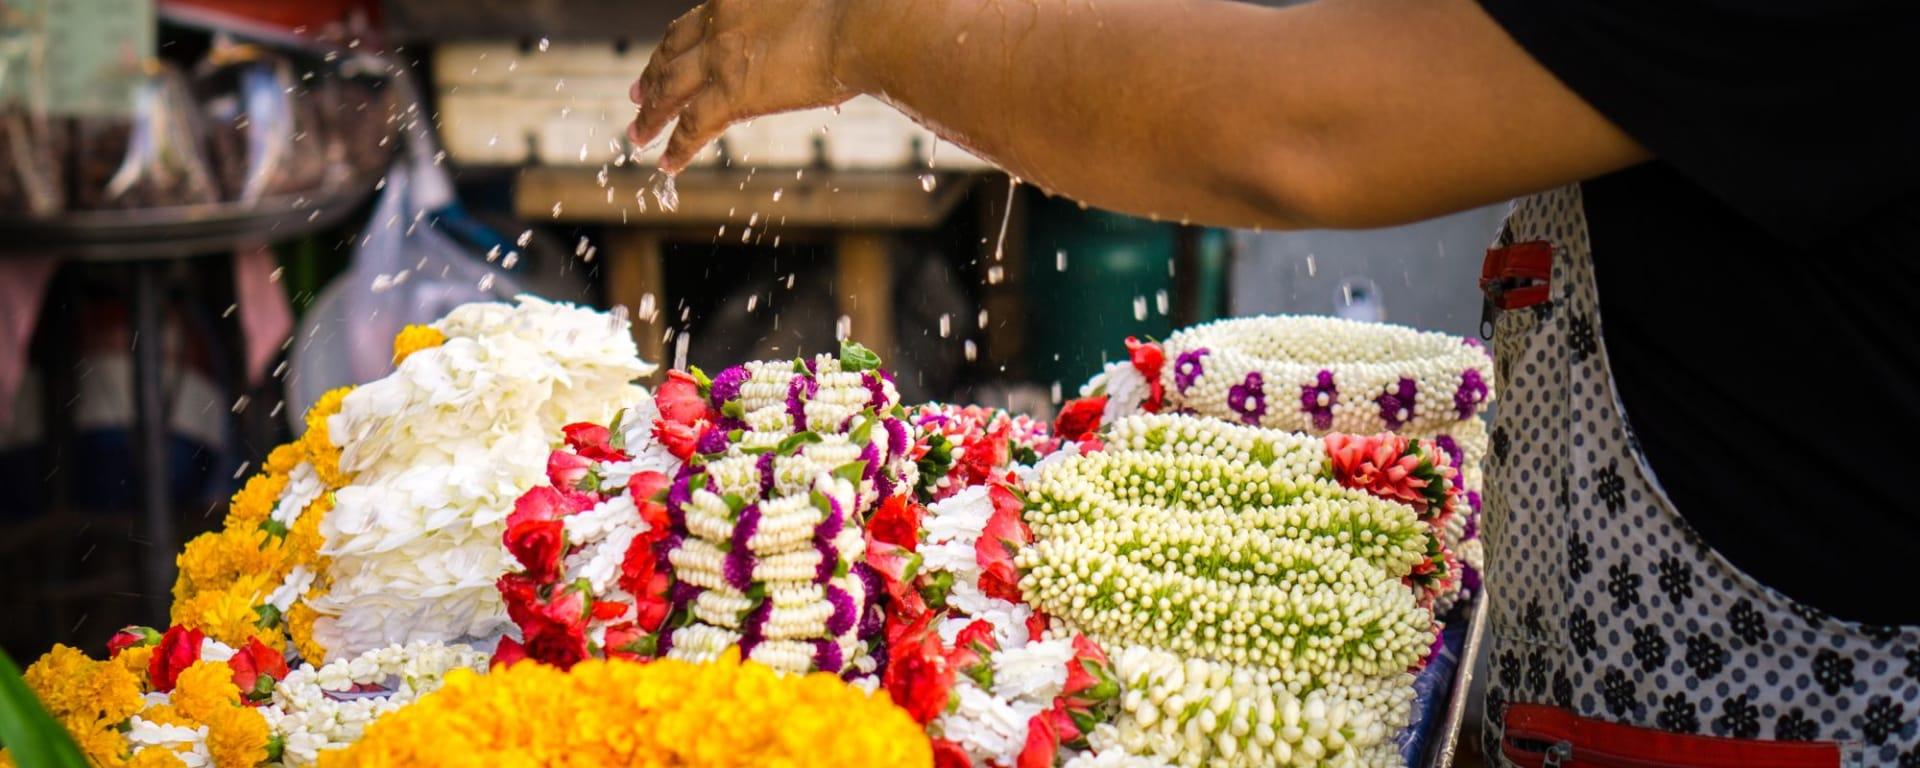 River of Kings- à pied, en tuk-tuk et en bateau à Bangkok: Watering jasmine garland in Thailand street market